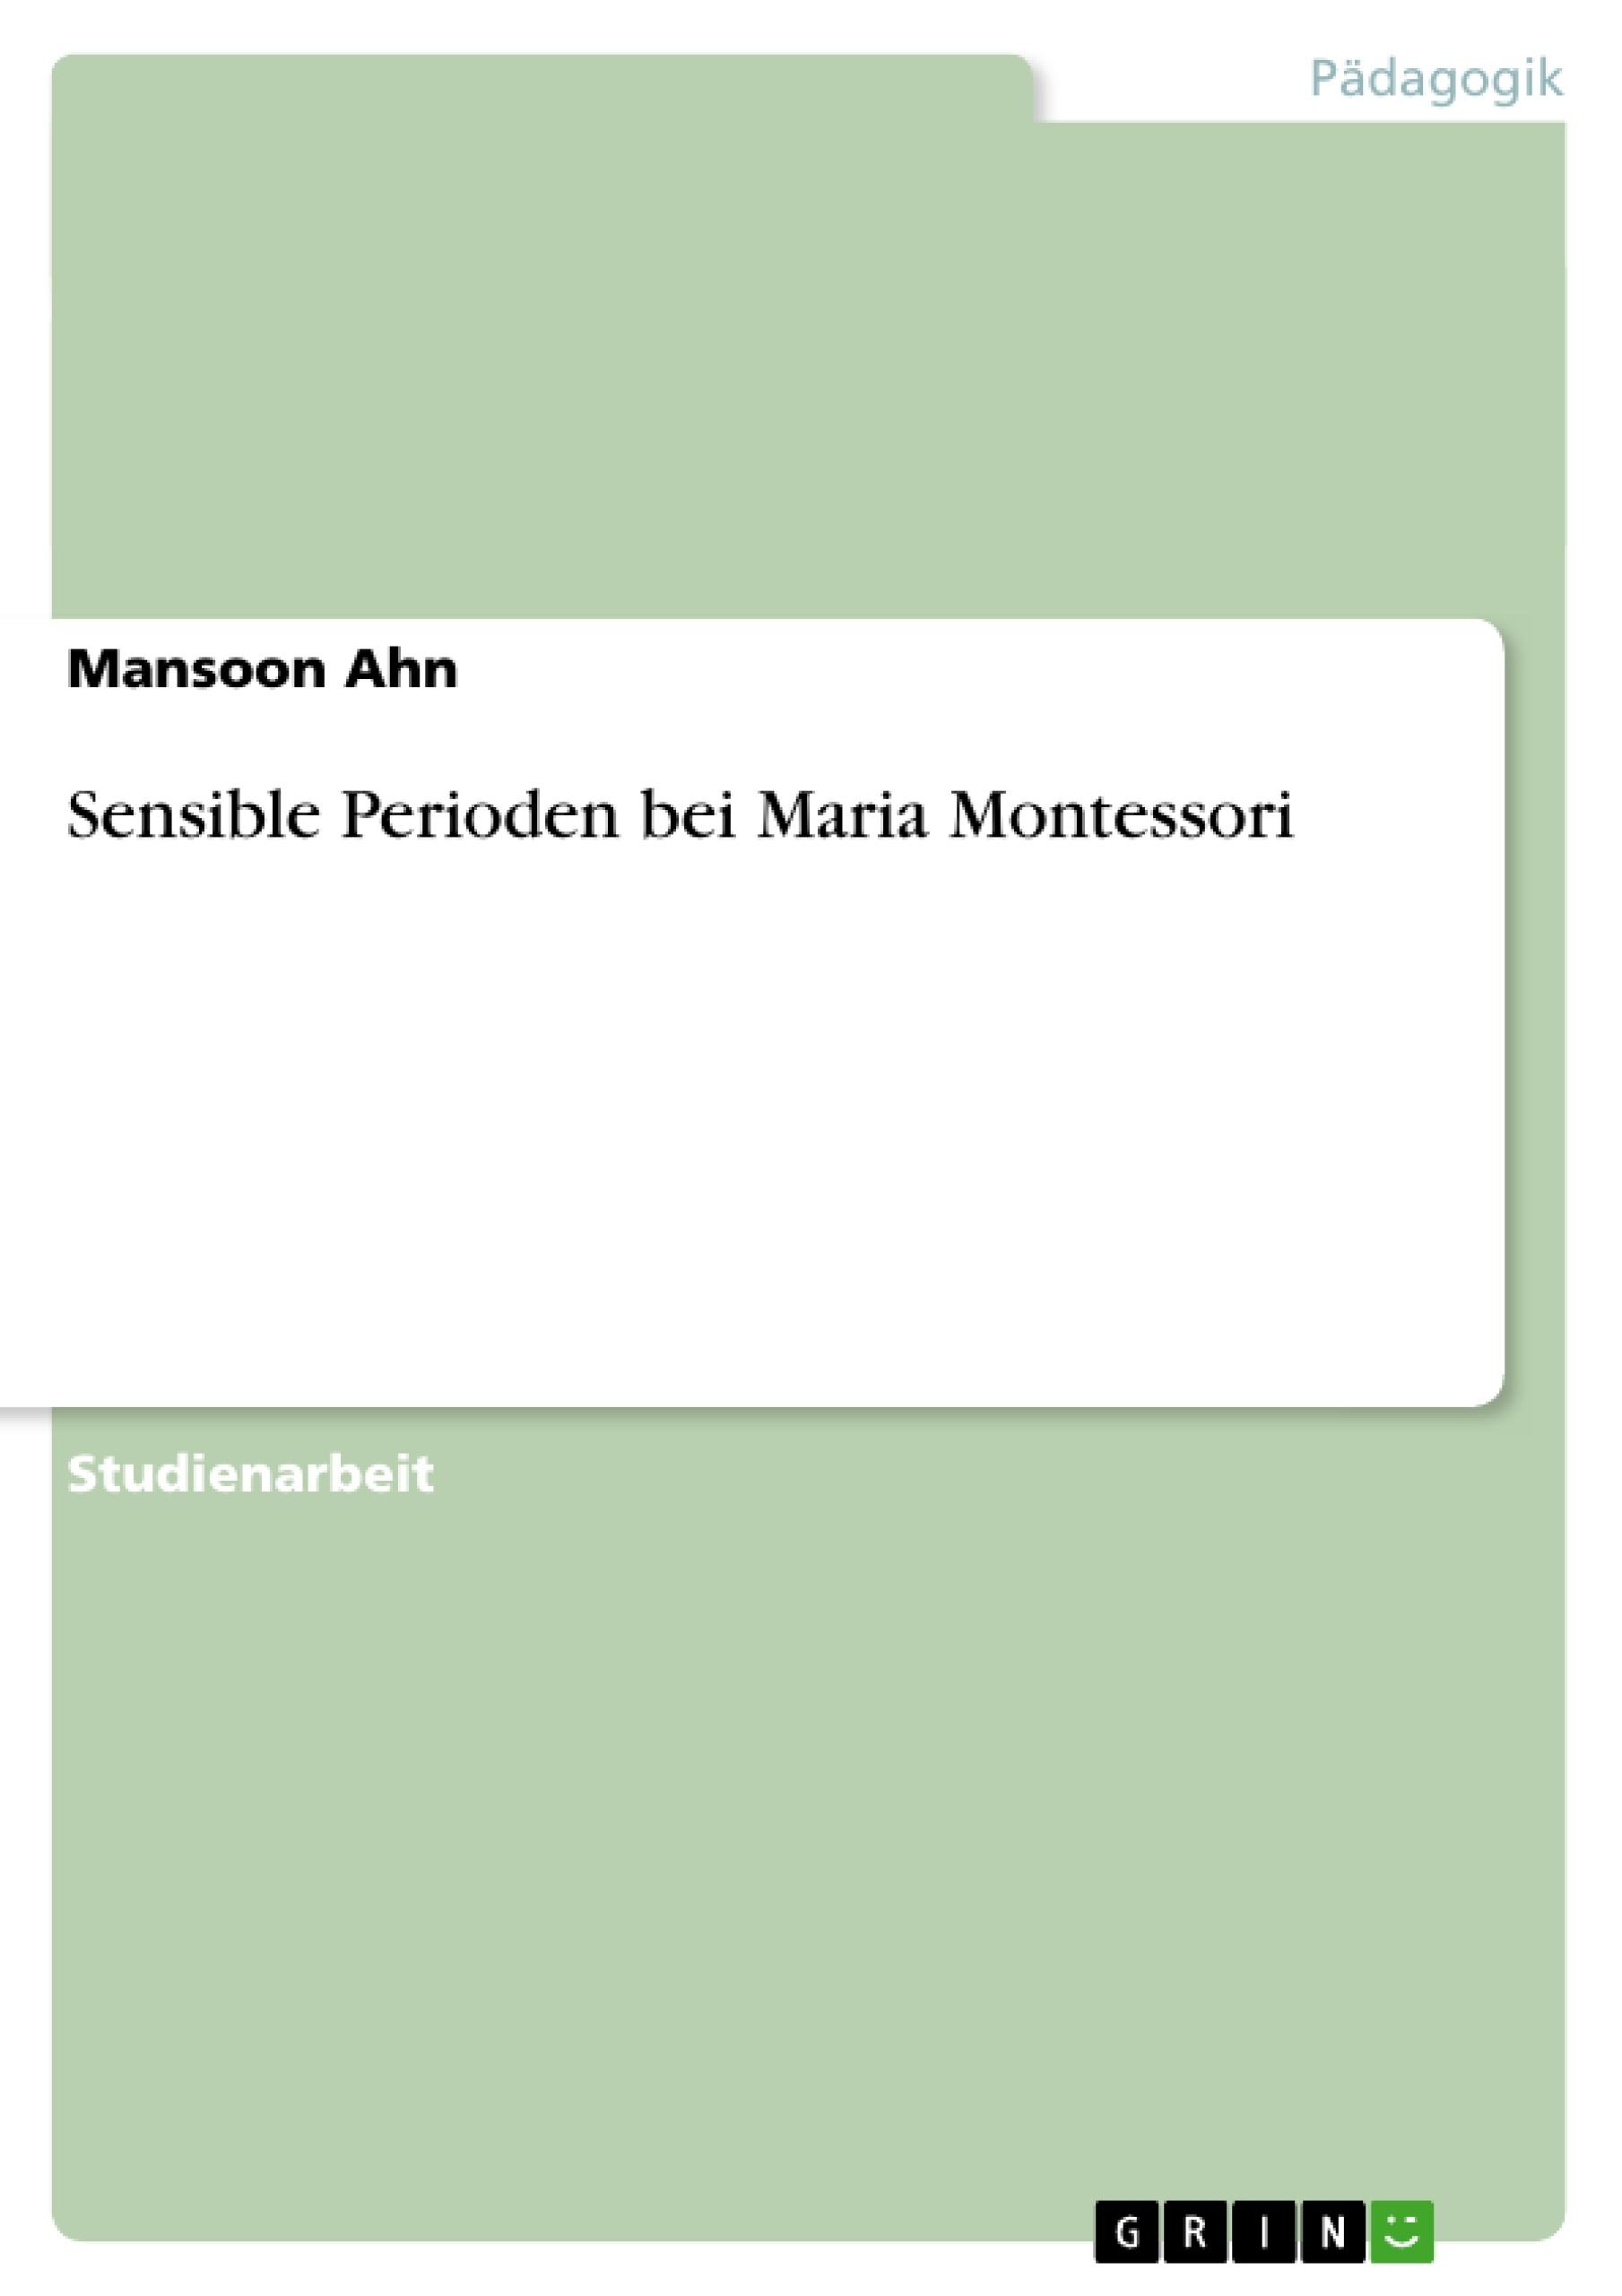 Titel: Sensible Perioden bei Maria Montessori